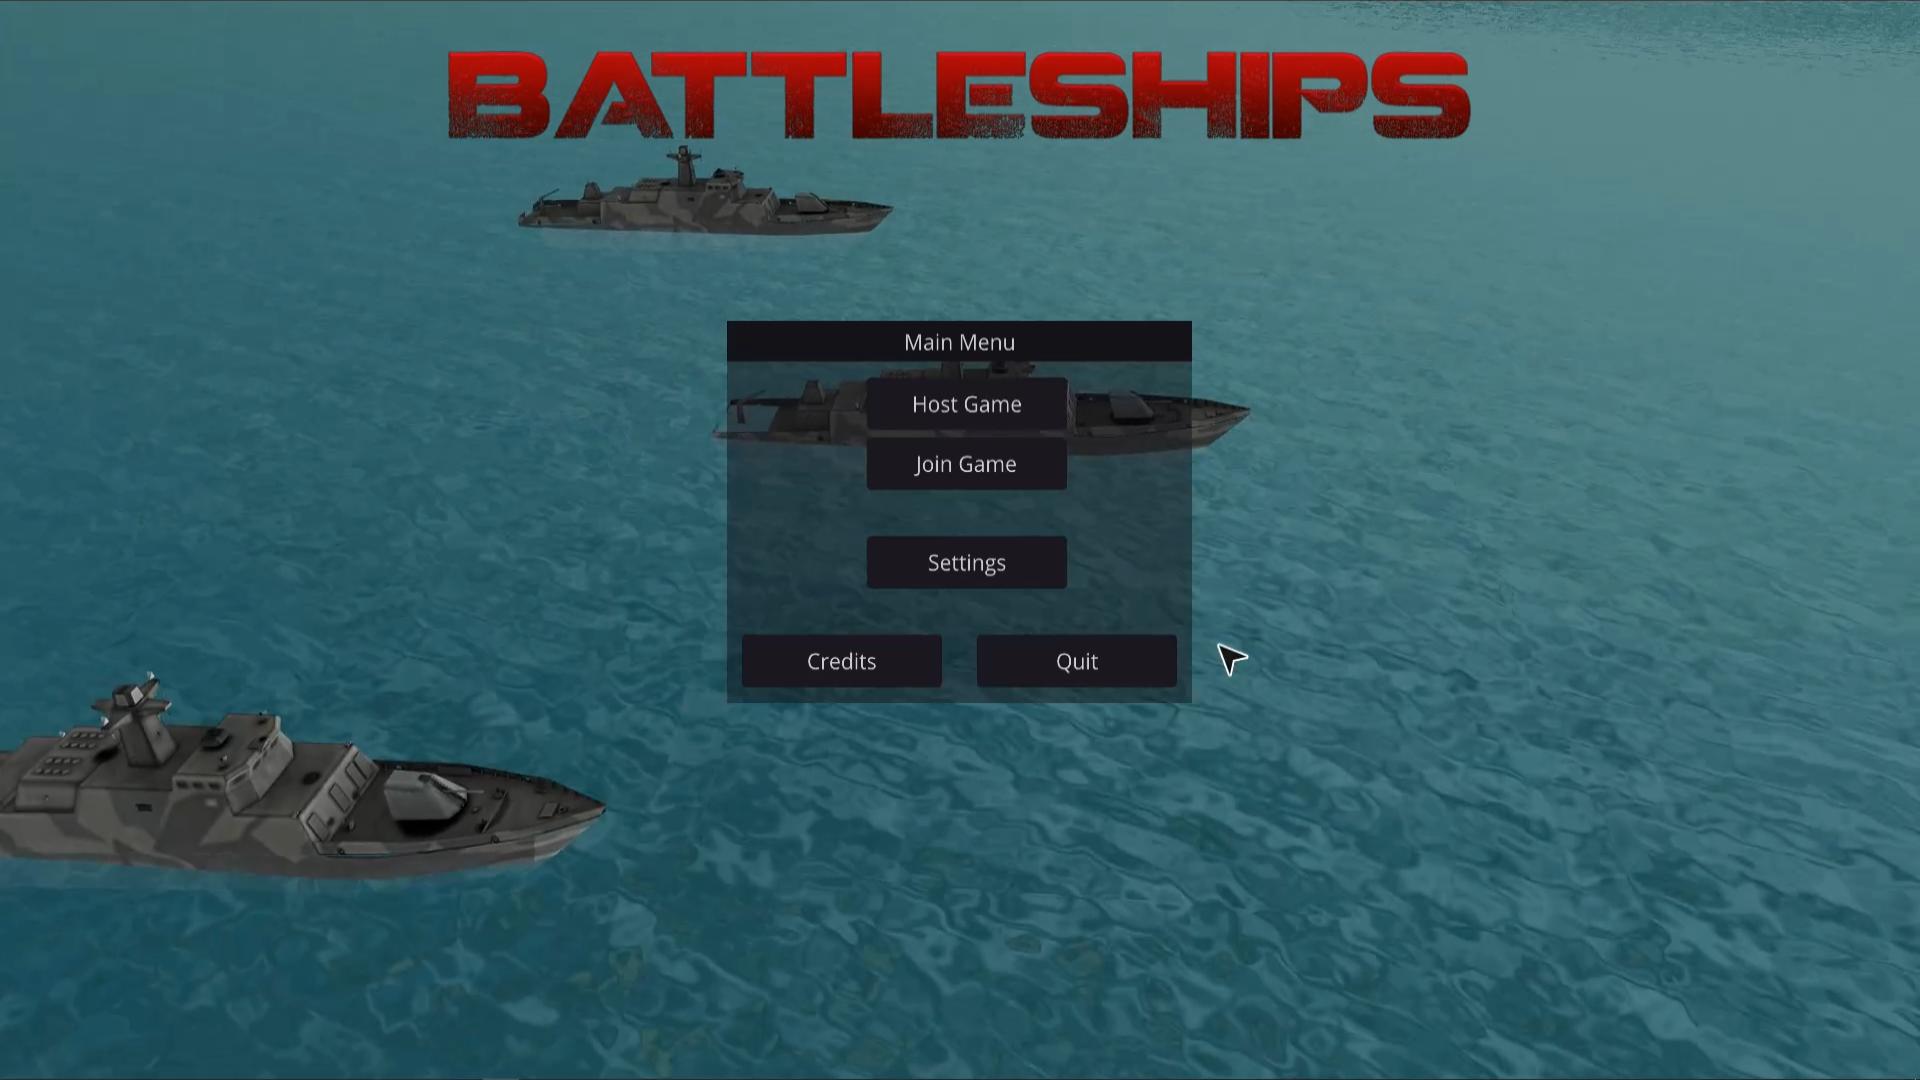 Battleships_Menu